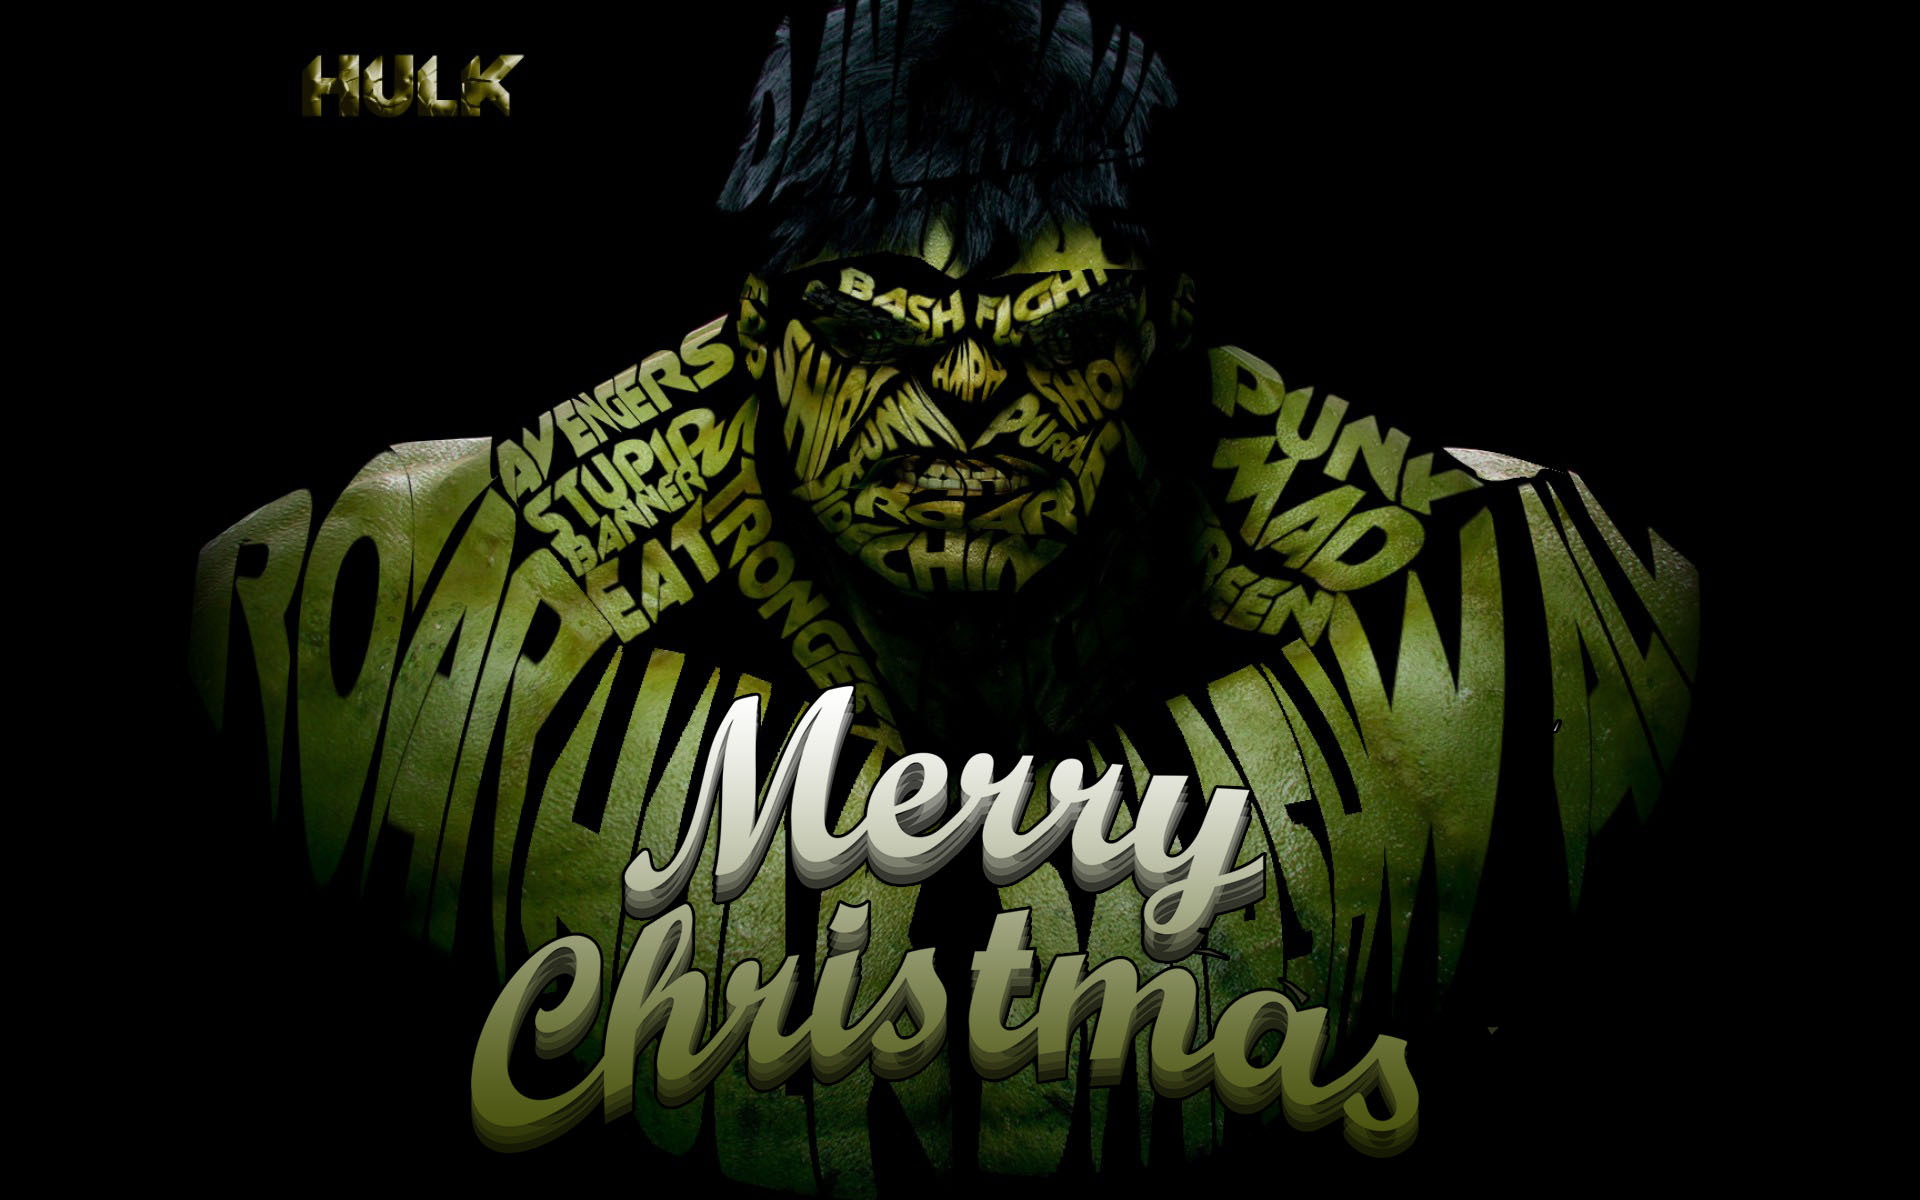 happy merry christmas incredible hulk marvel avenger superhero background hd wallpaper